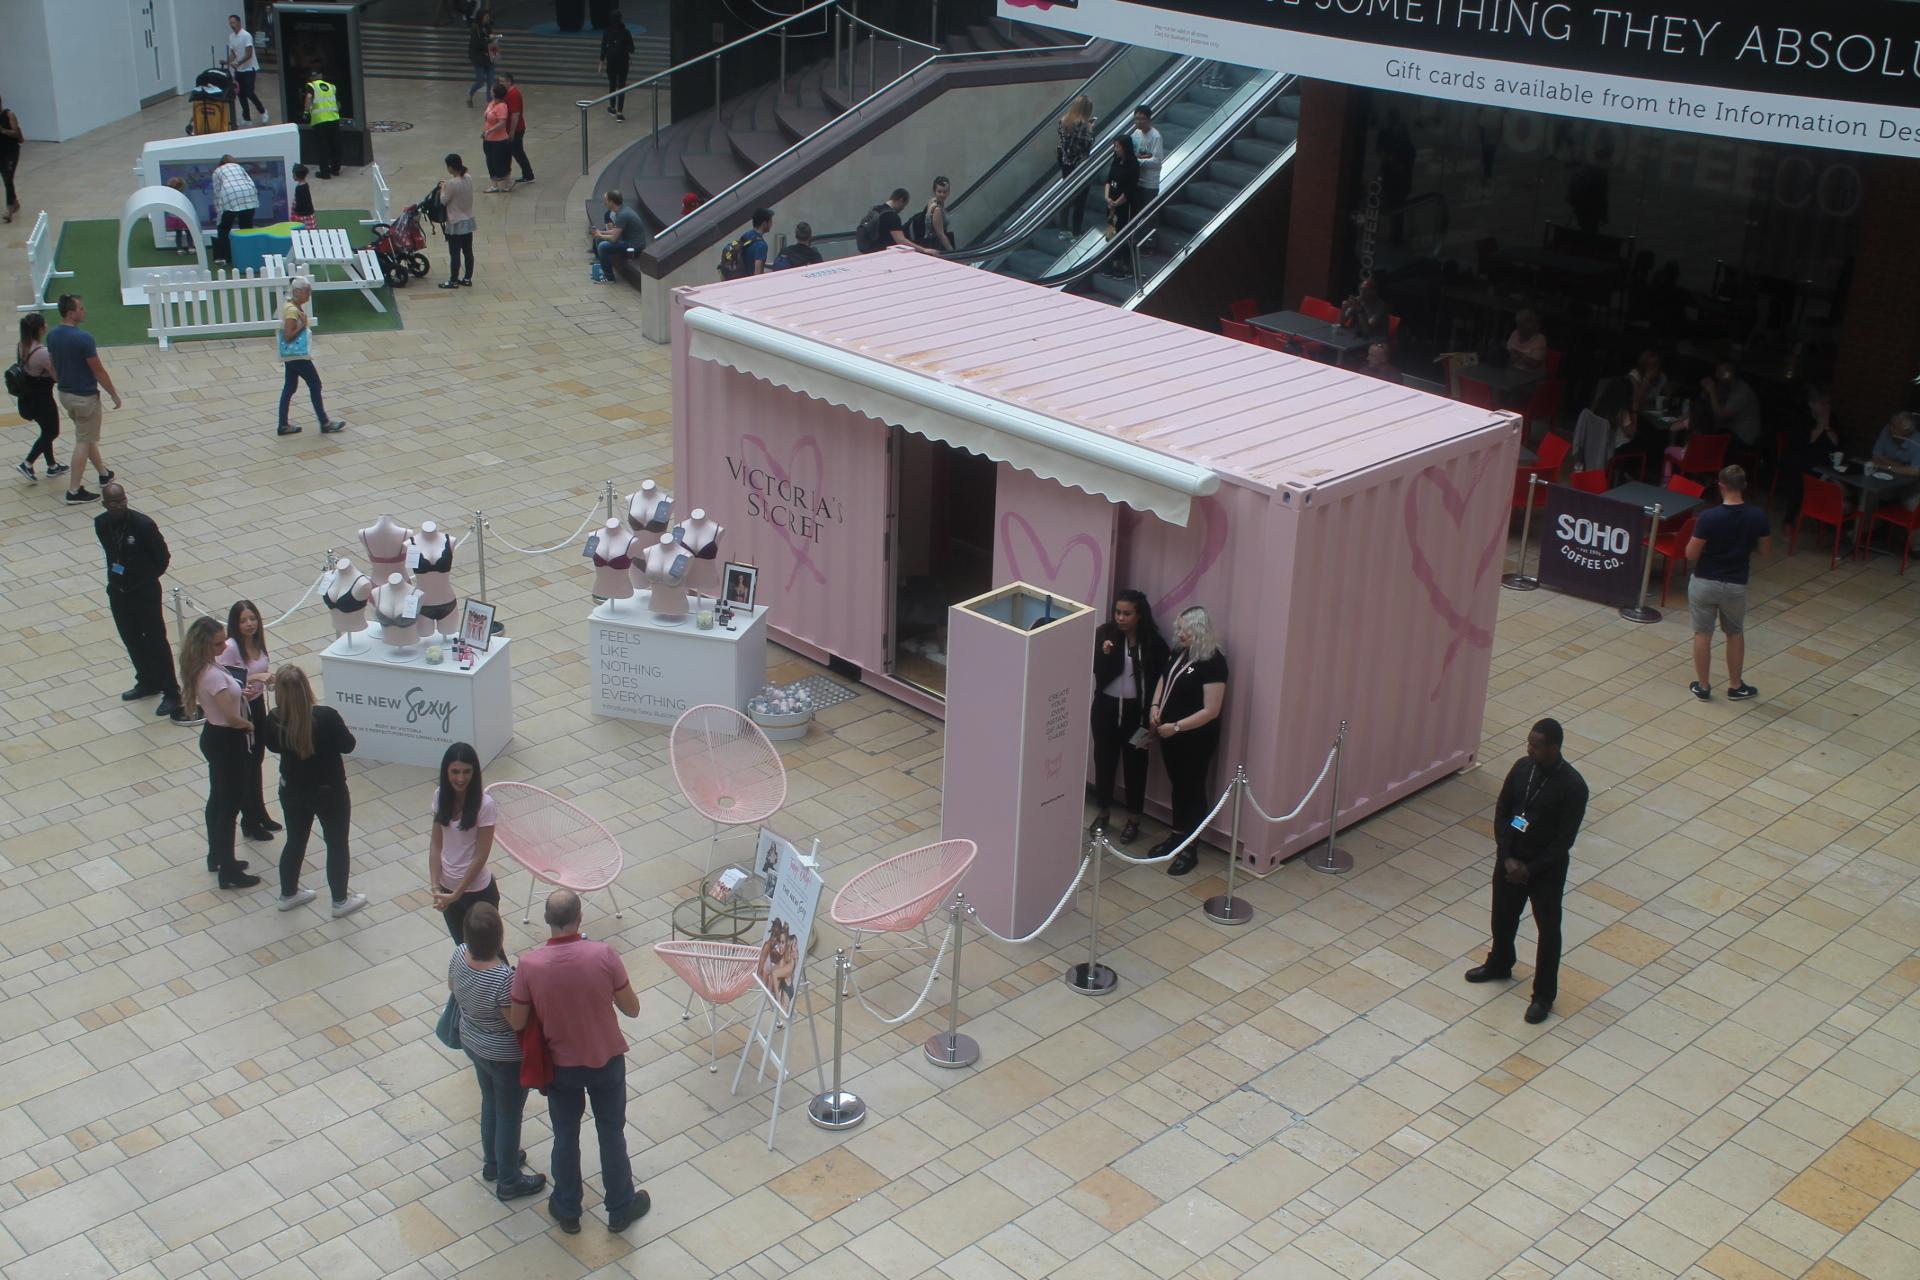 Creative Spaces help Victoria's Secret embrace pop-up retail & brand experience